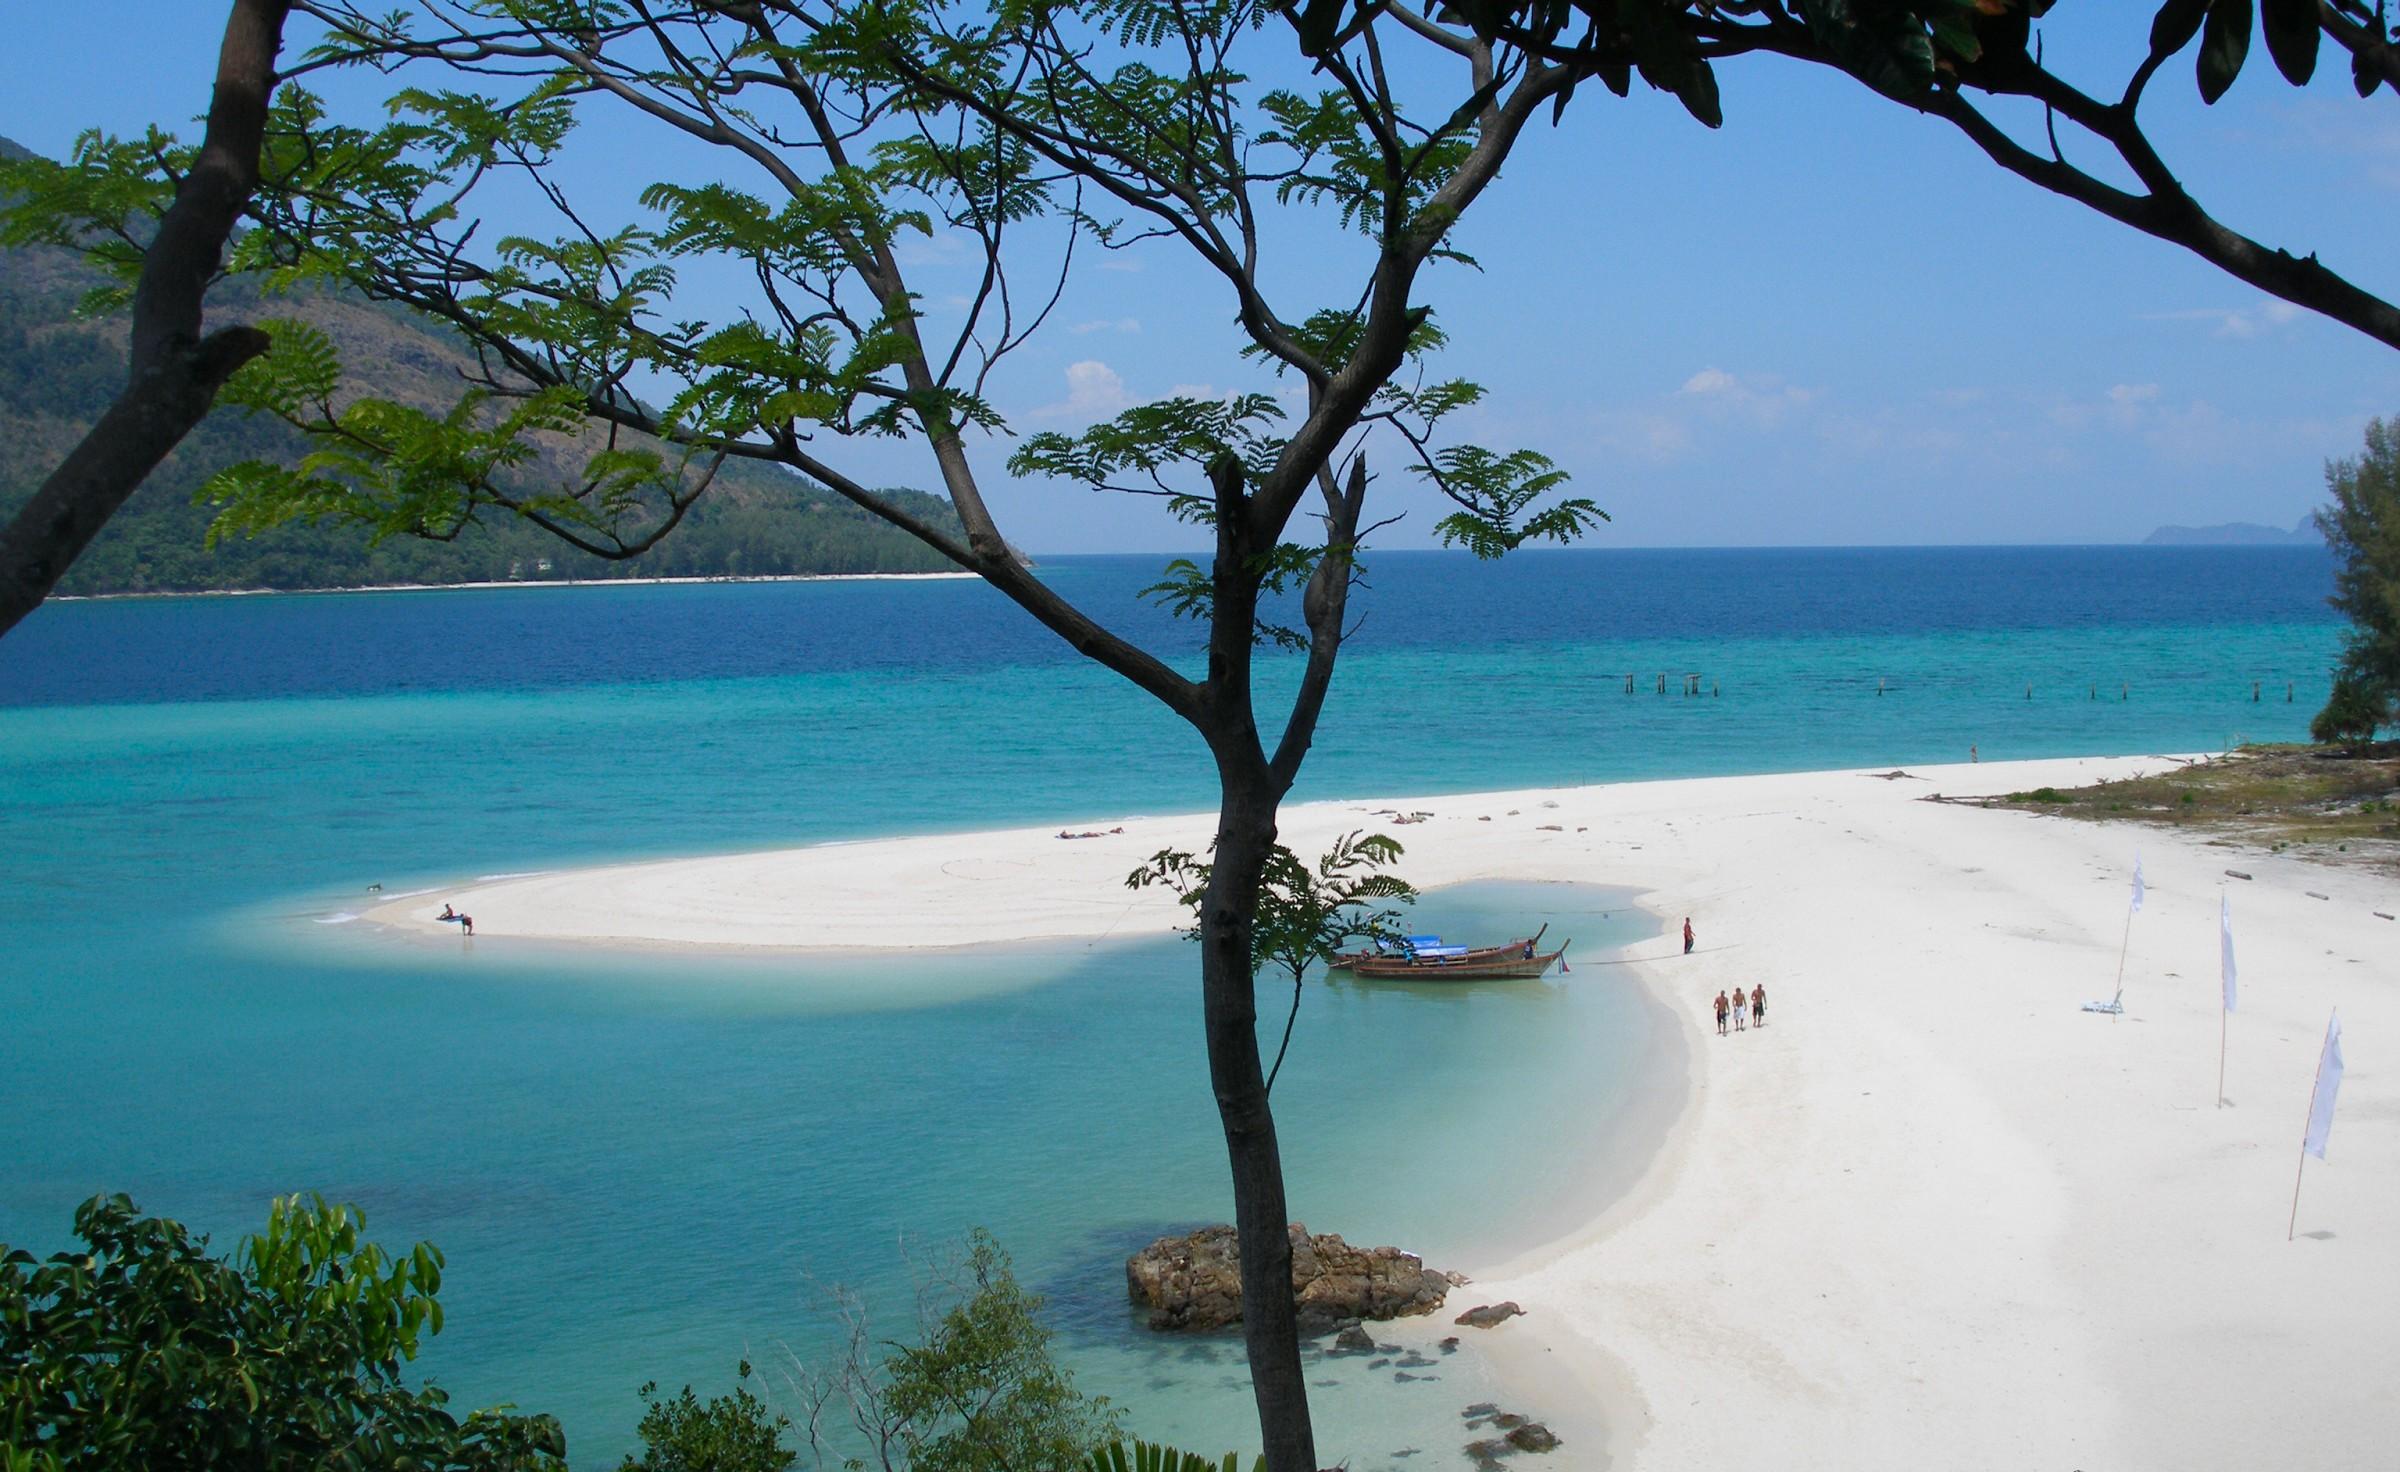 Koh-Lipe-in-Andaman-Sea